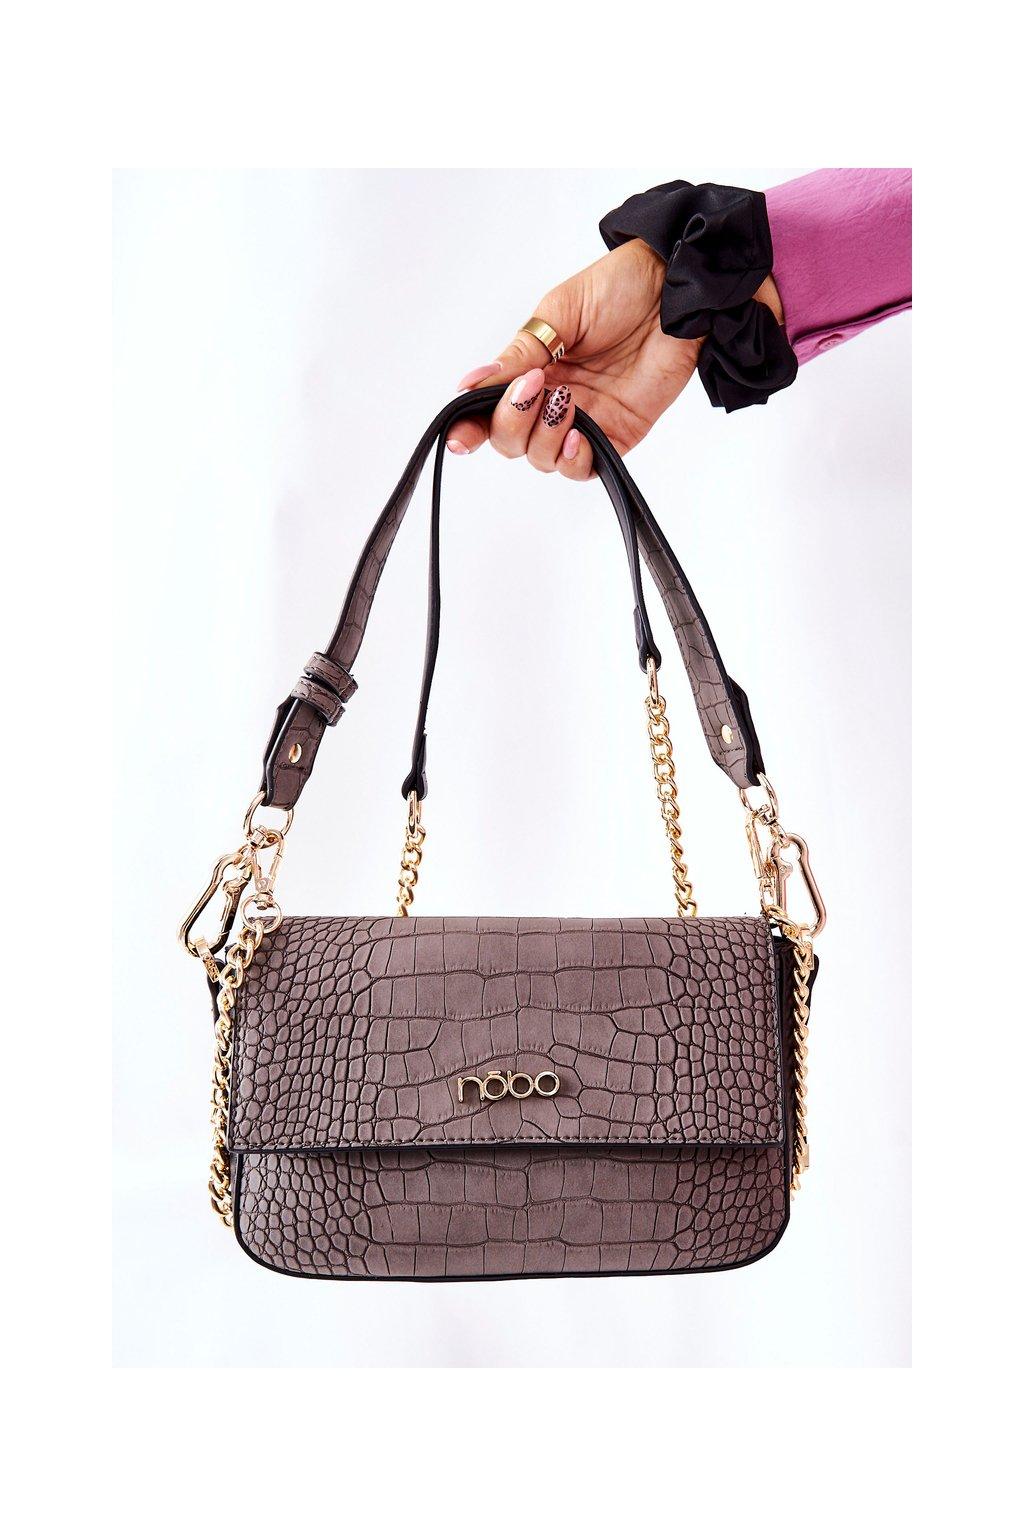 Dámska kabelka sivá kód kabelky NBAG-L2150-C020